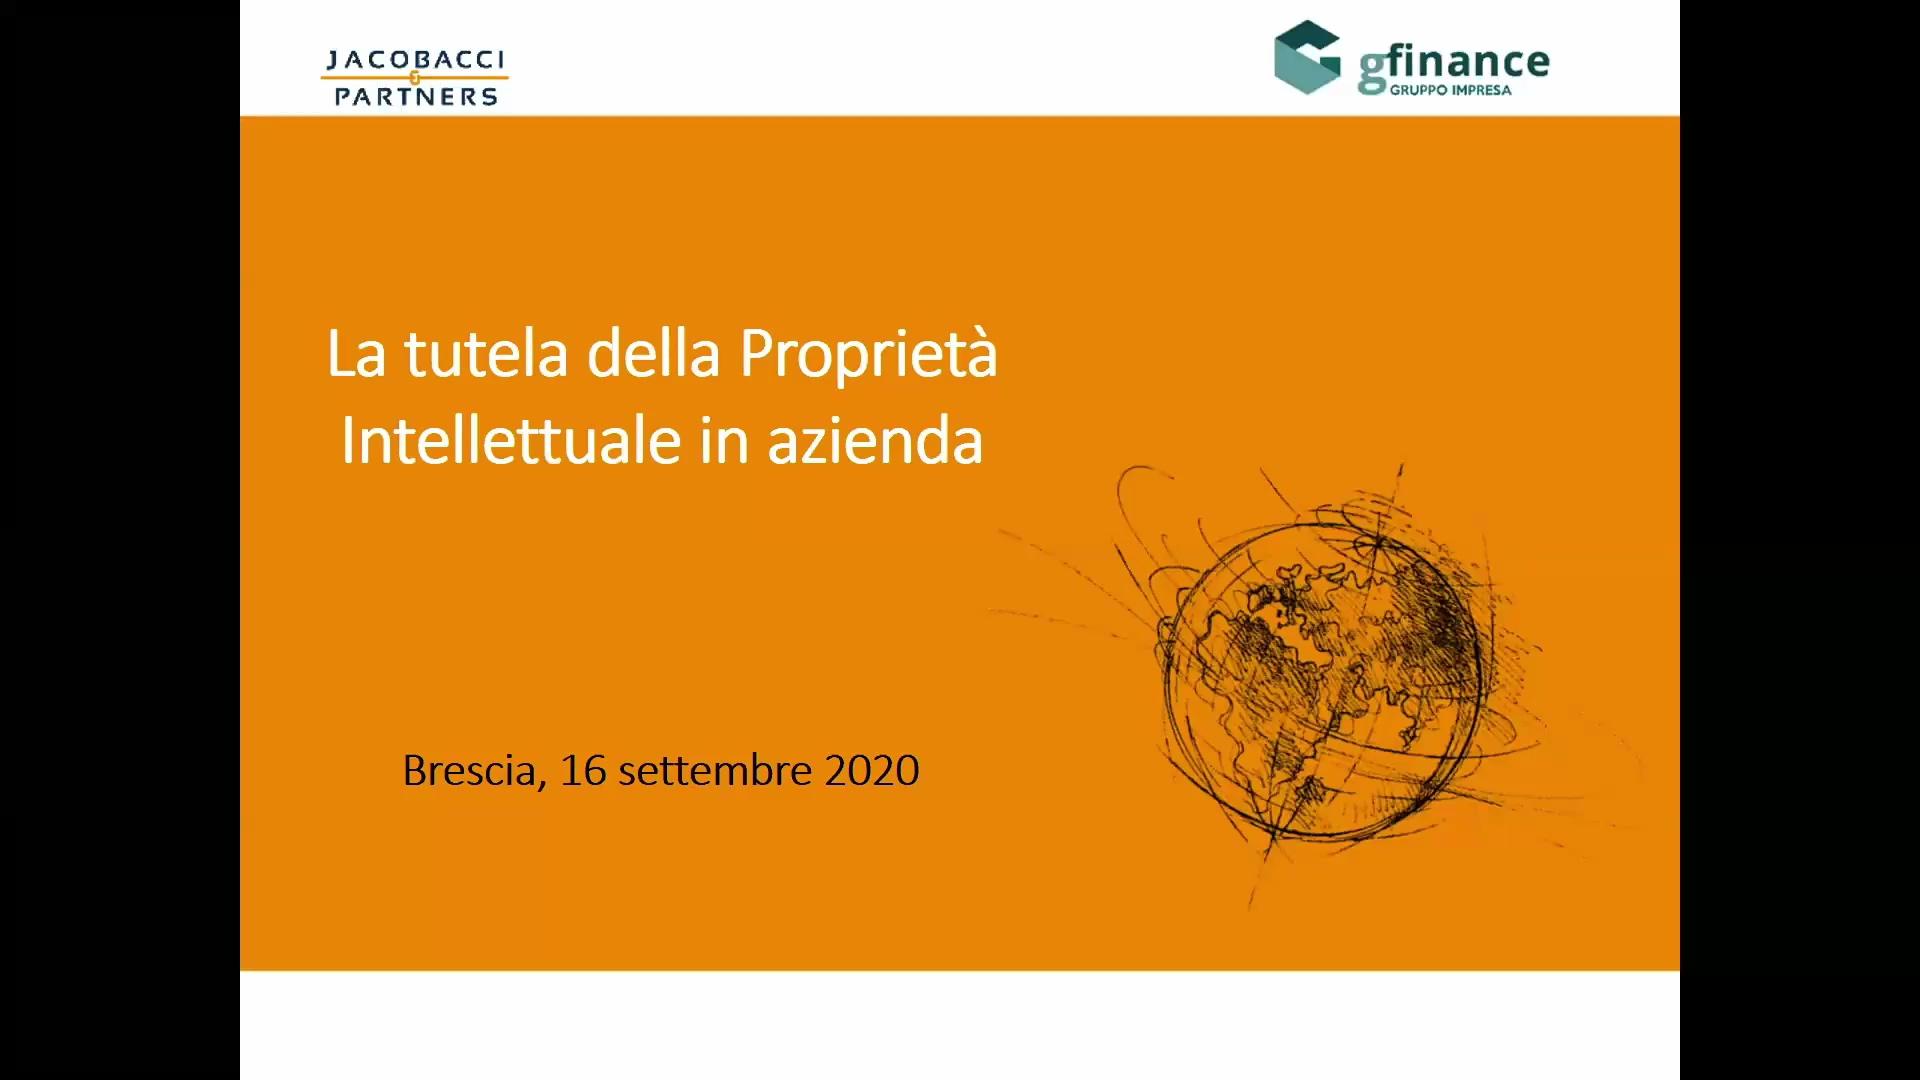 Webinar-Chimini-G-finance